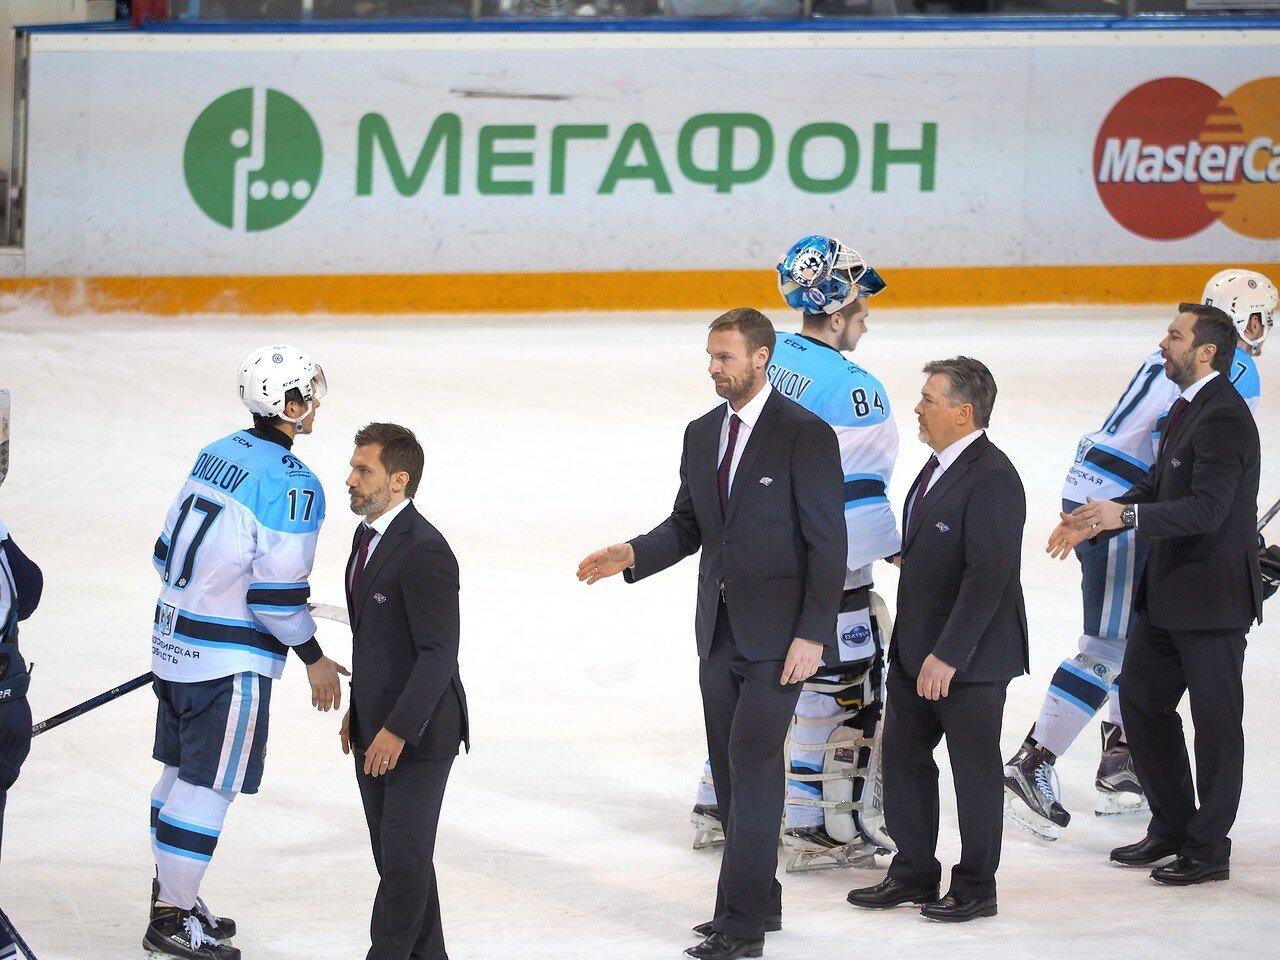 88Плей-офф 2016 Восток 1/2 Металлург - Сибирь 16.03.2016